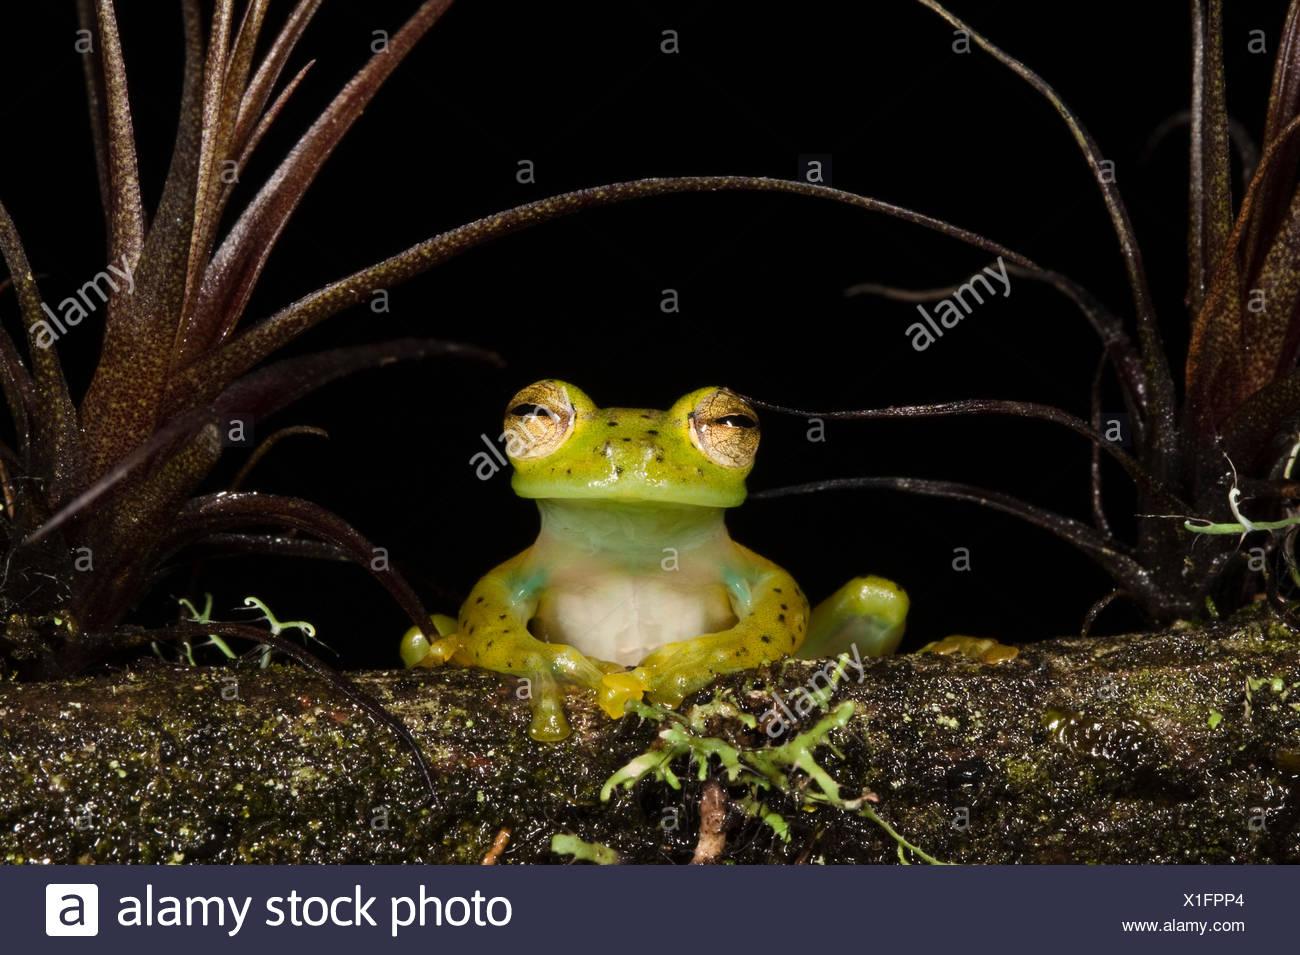 Portrait of an Emerald Glass Frog (Espadarana / Centrolenella prosoblepon). Captive. Chocó Region of northwest Ecuador. - Stock Image